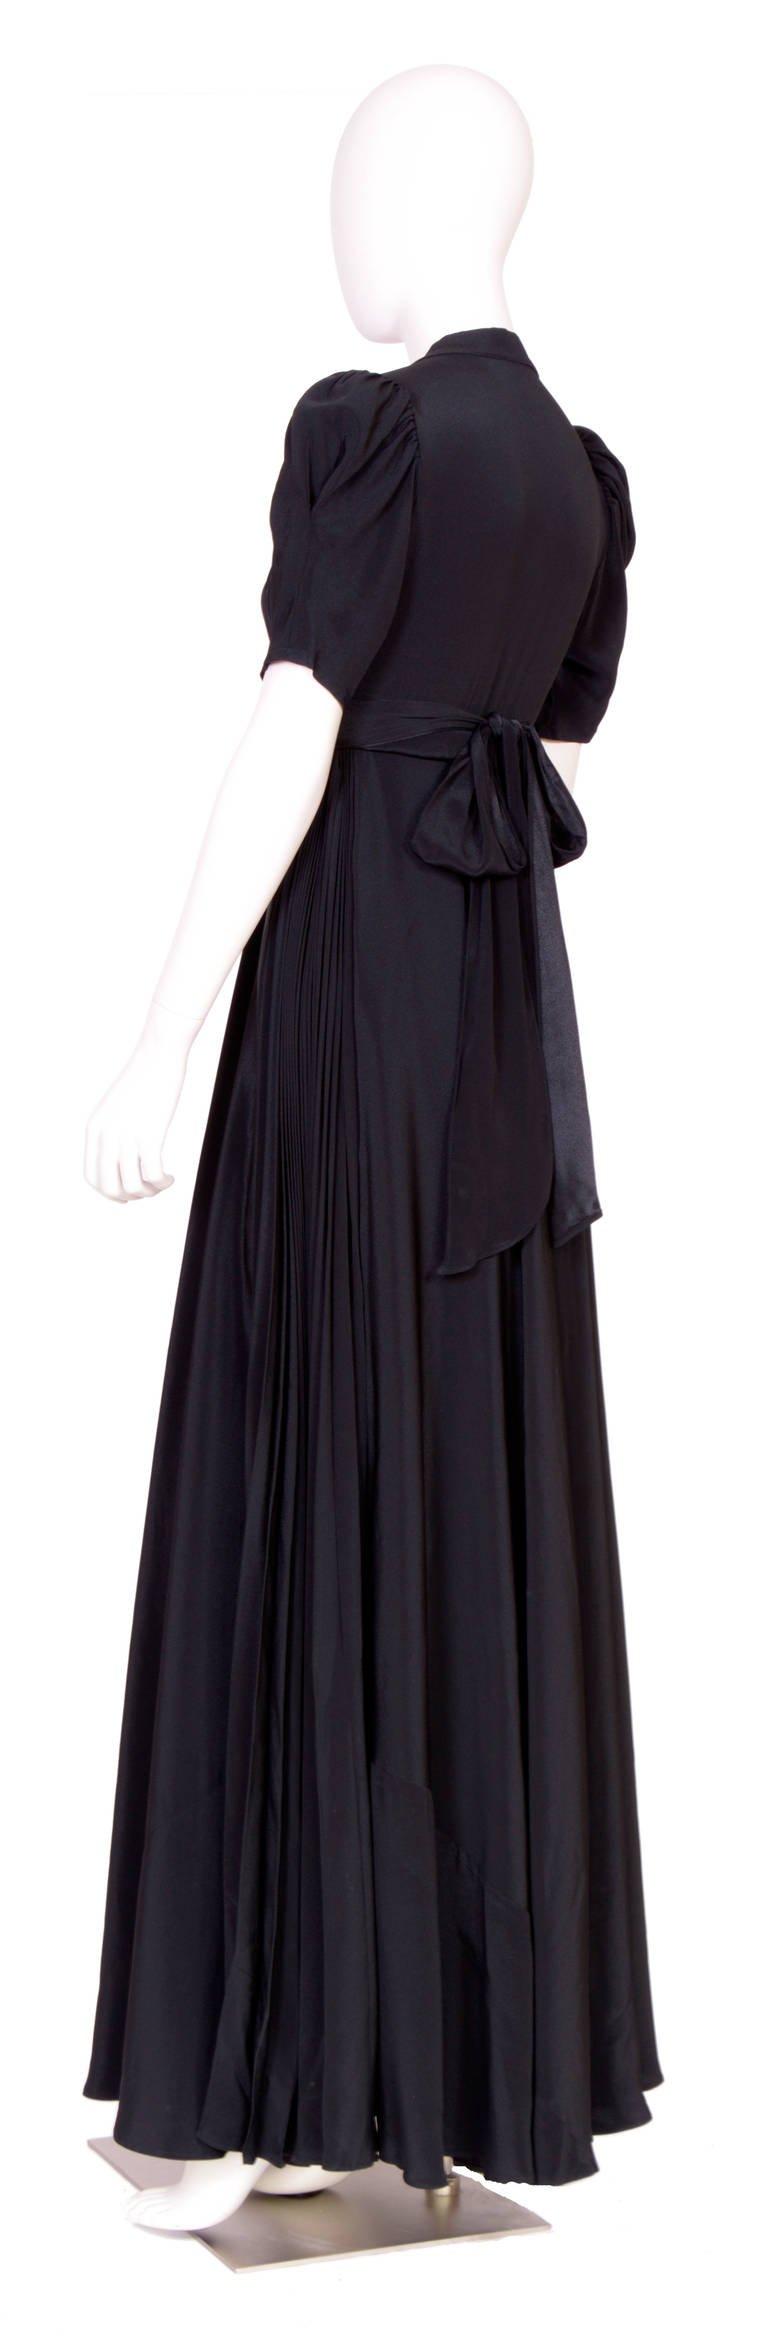 Vintage ossie clark for quorum black wrap dress ossie clark wrap